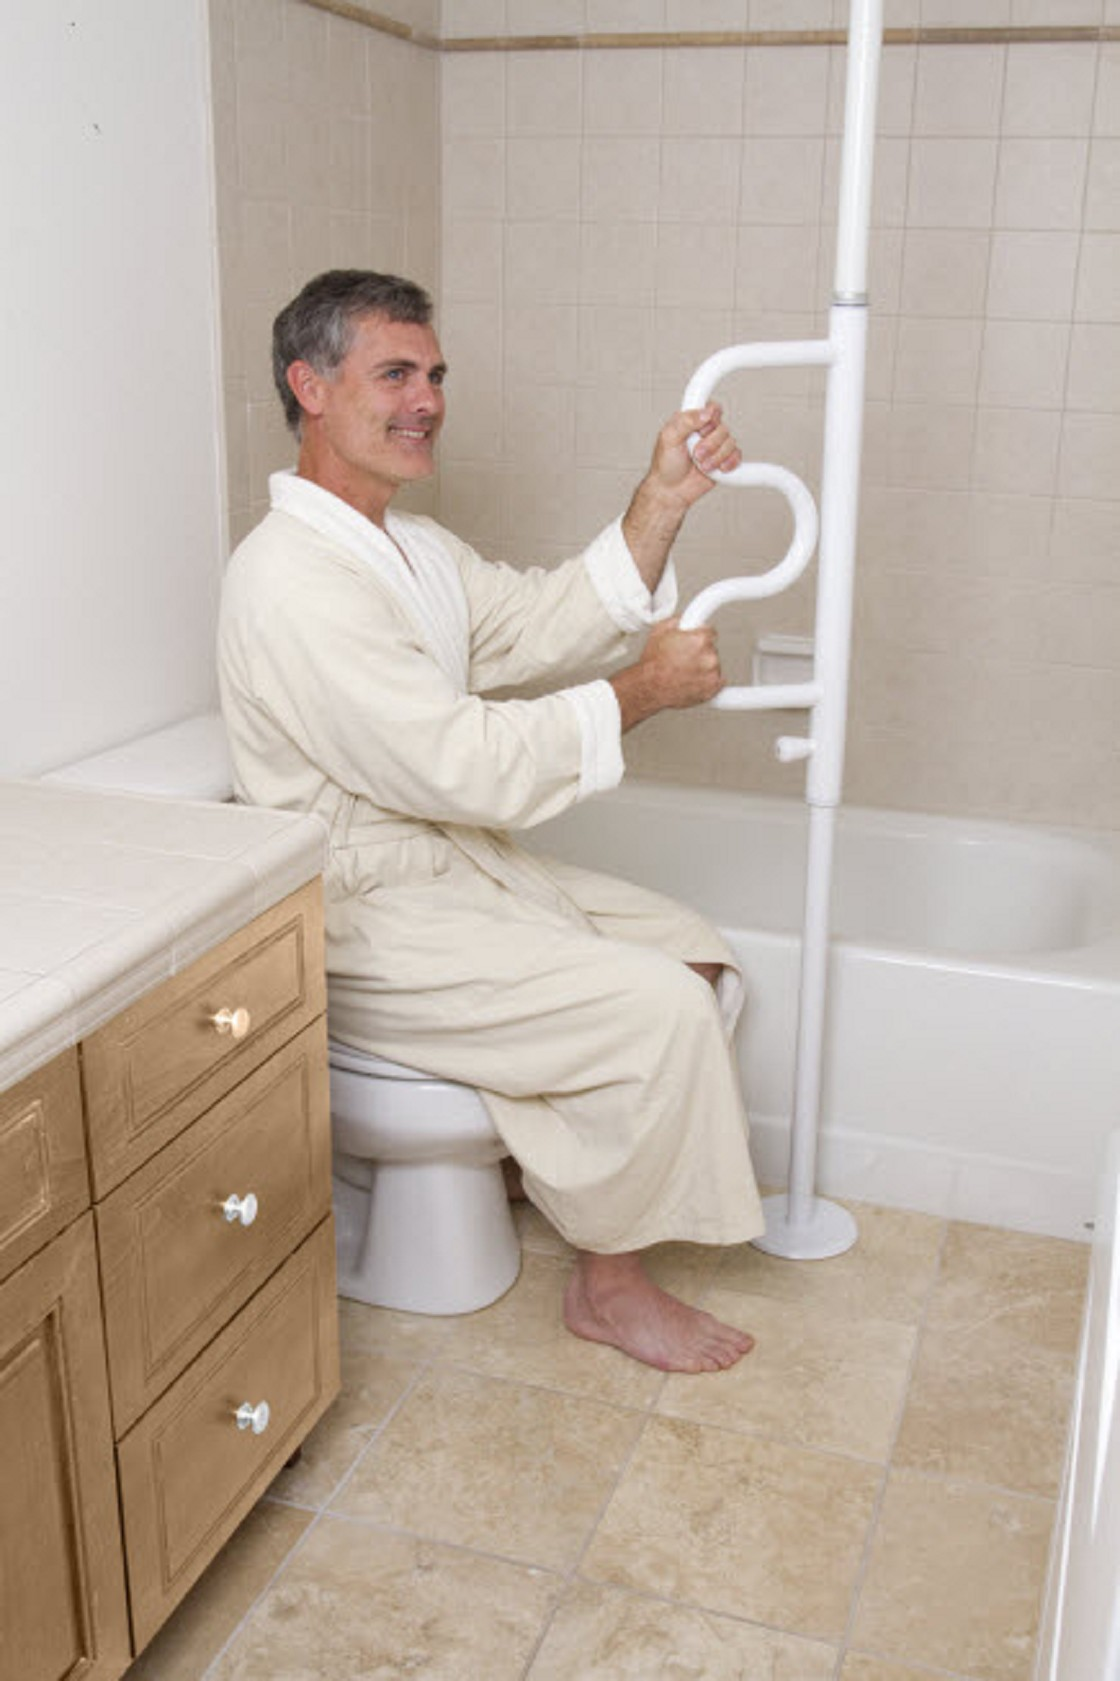 Security Pole and Curve Grab Bar. Bathroom Support Rails   Grab Bars   Shower Grab Bars   ON SALE